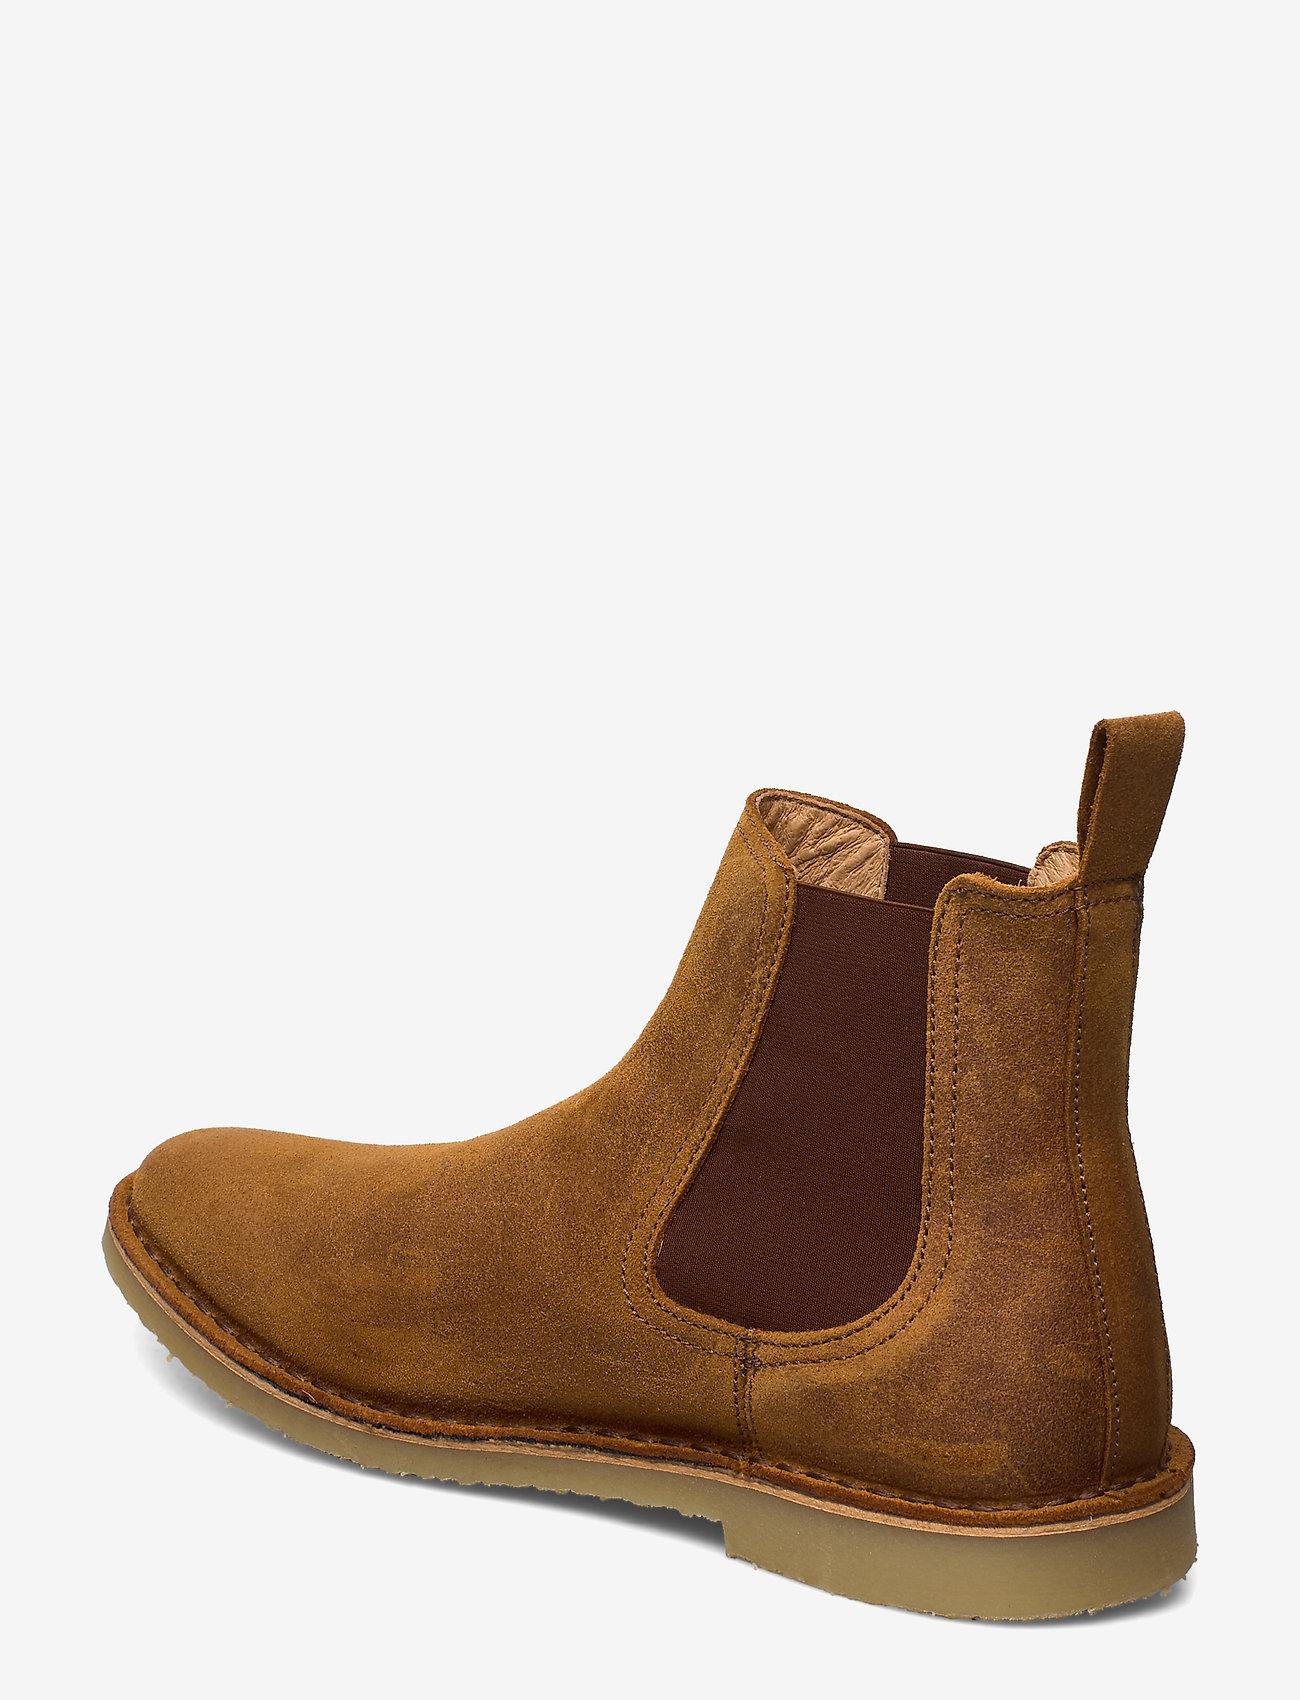 Chelsea Boot (Tan) - Makia pQ7l10